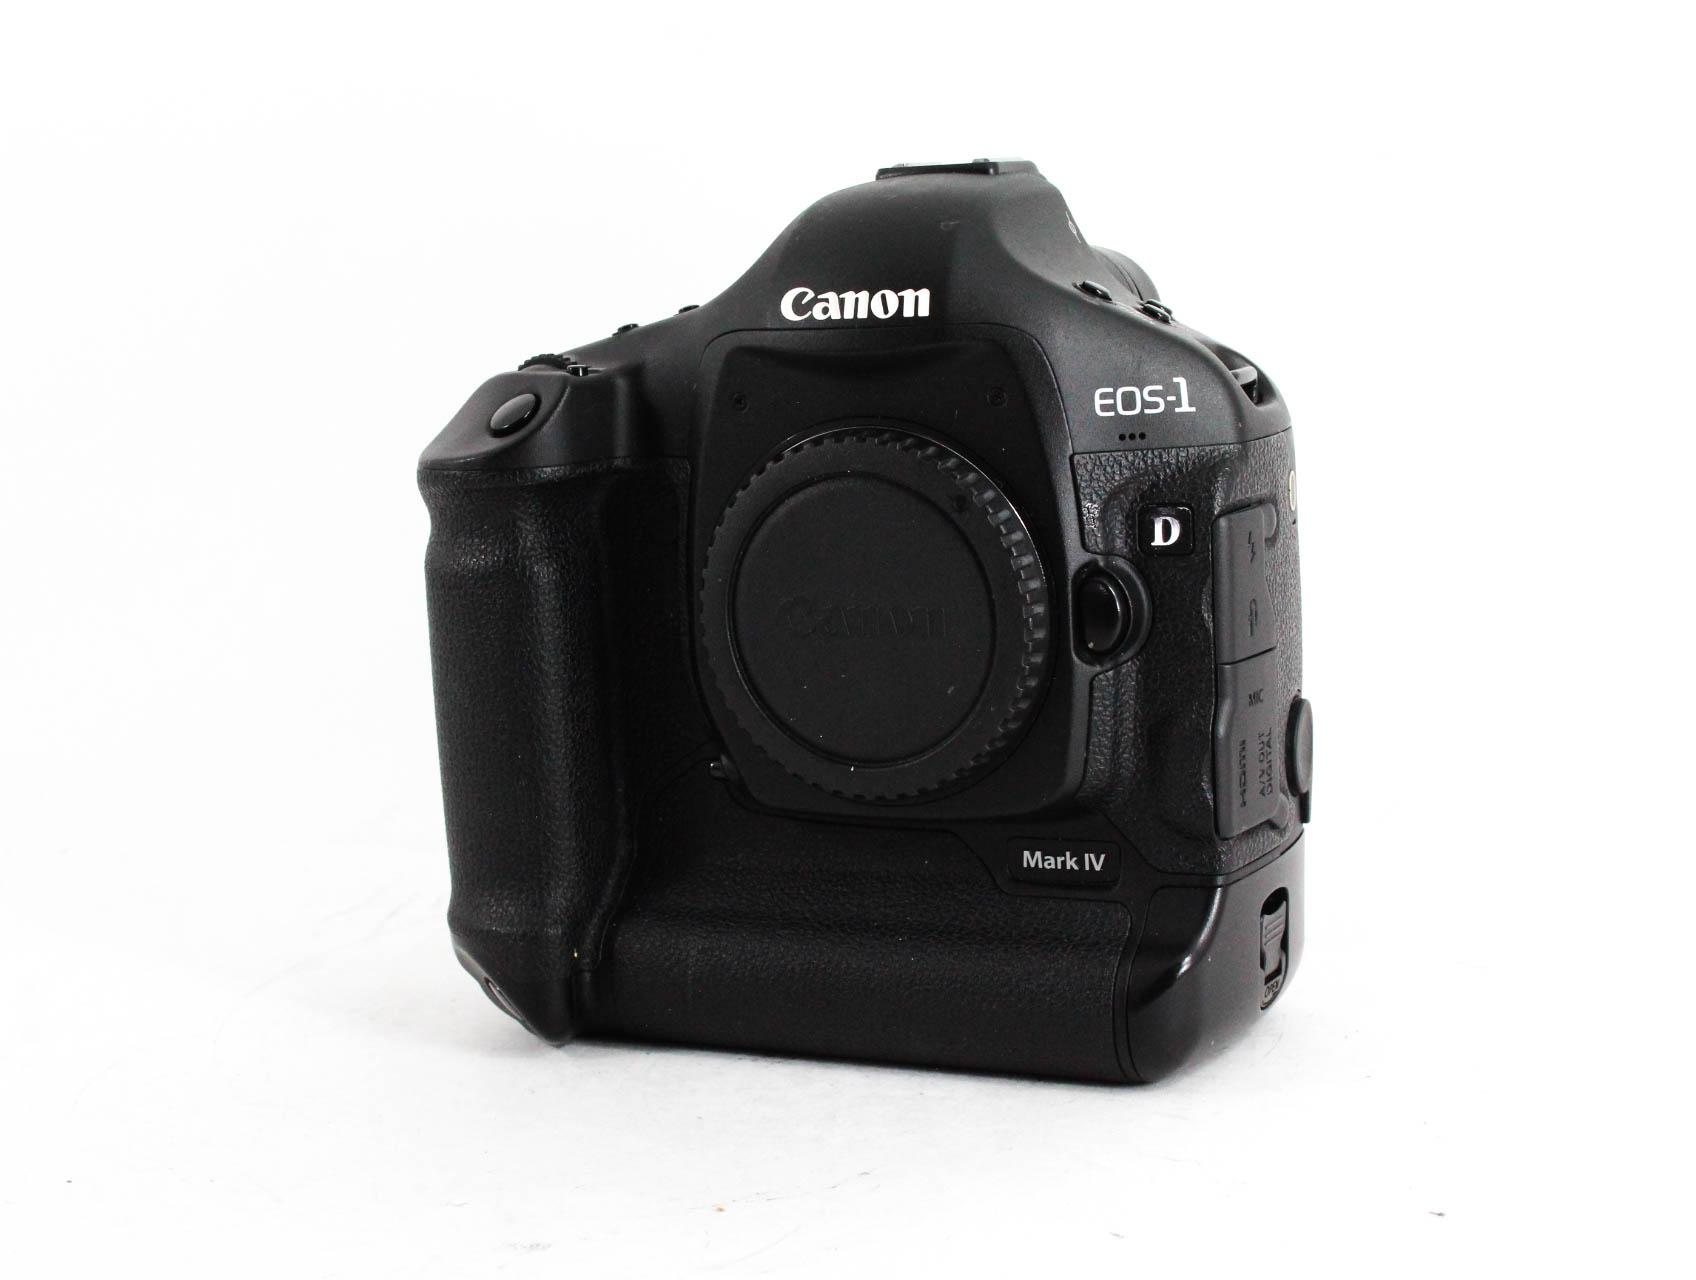 Canon 1D Mark IV Specs